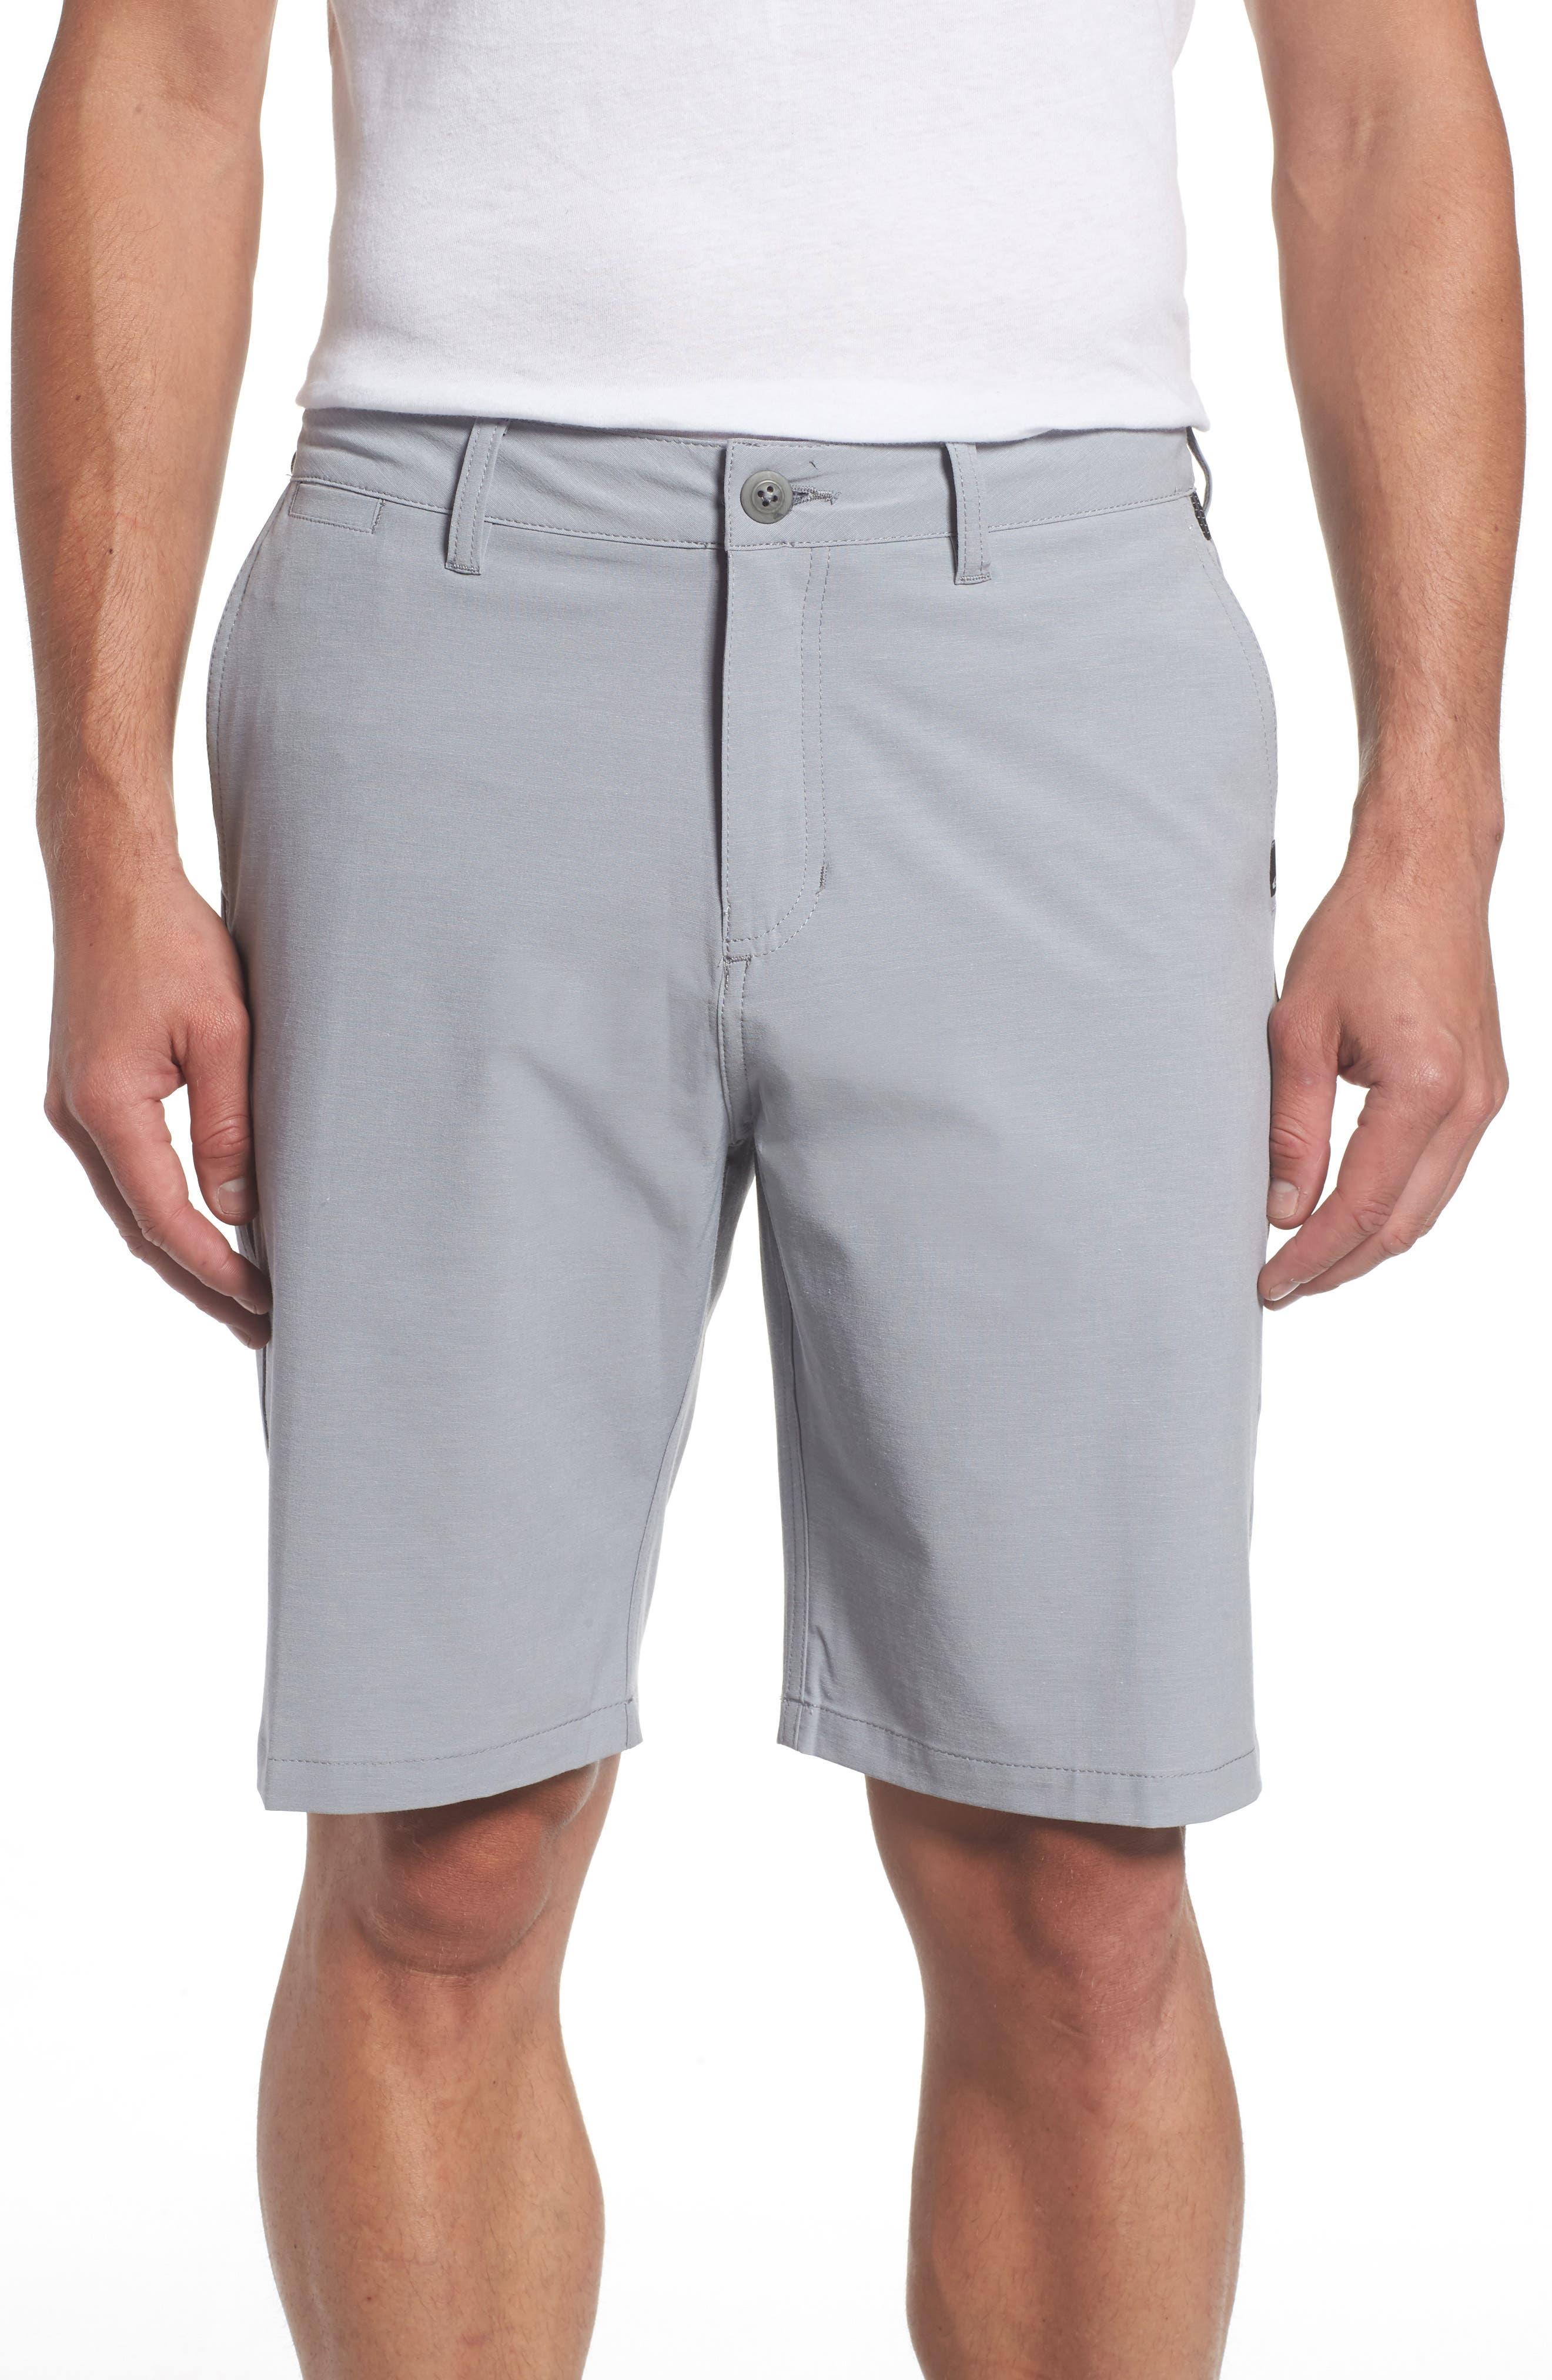 Quiksilver Union Amphibian Hybrid Shorts